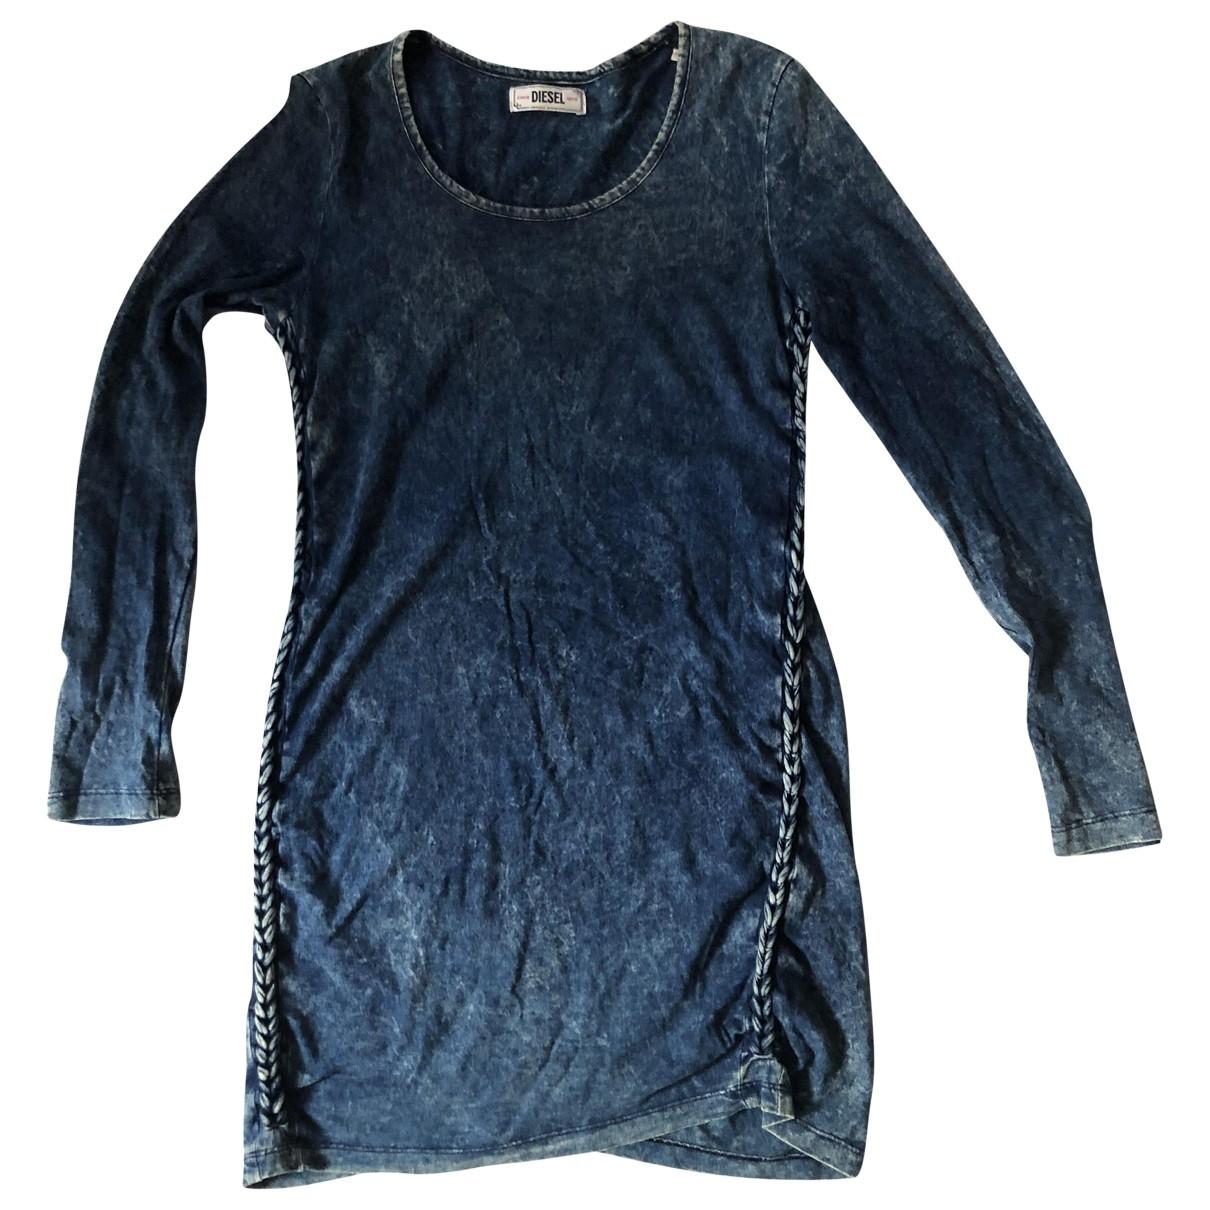 Diesel \N Blue Cotton - elasthane dress for Women 36 FR